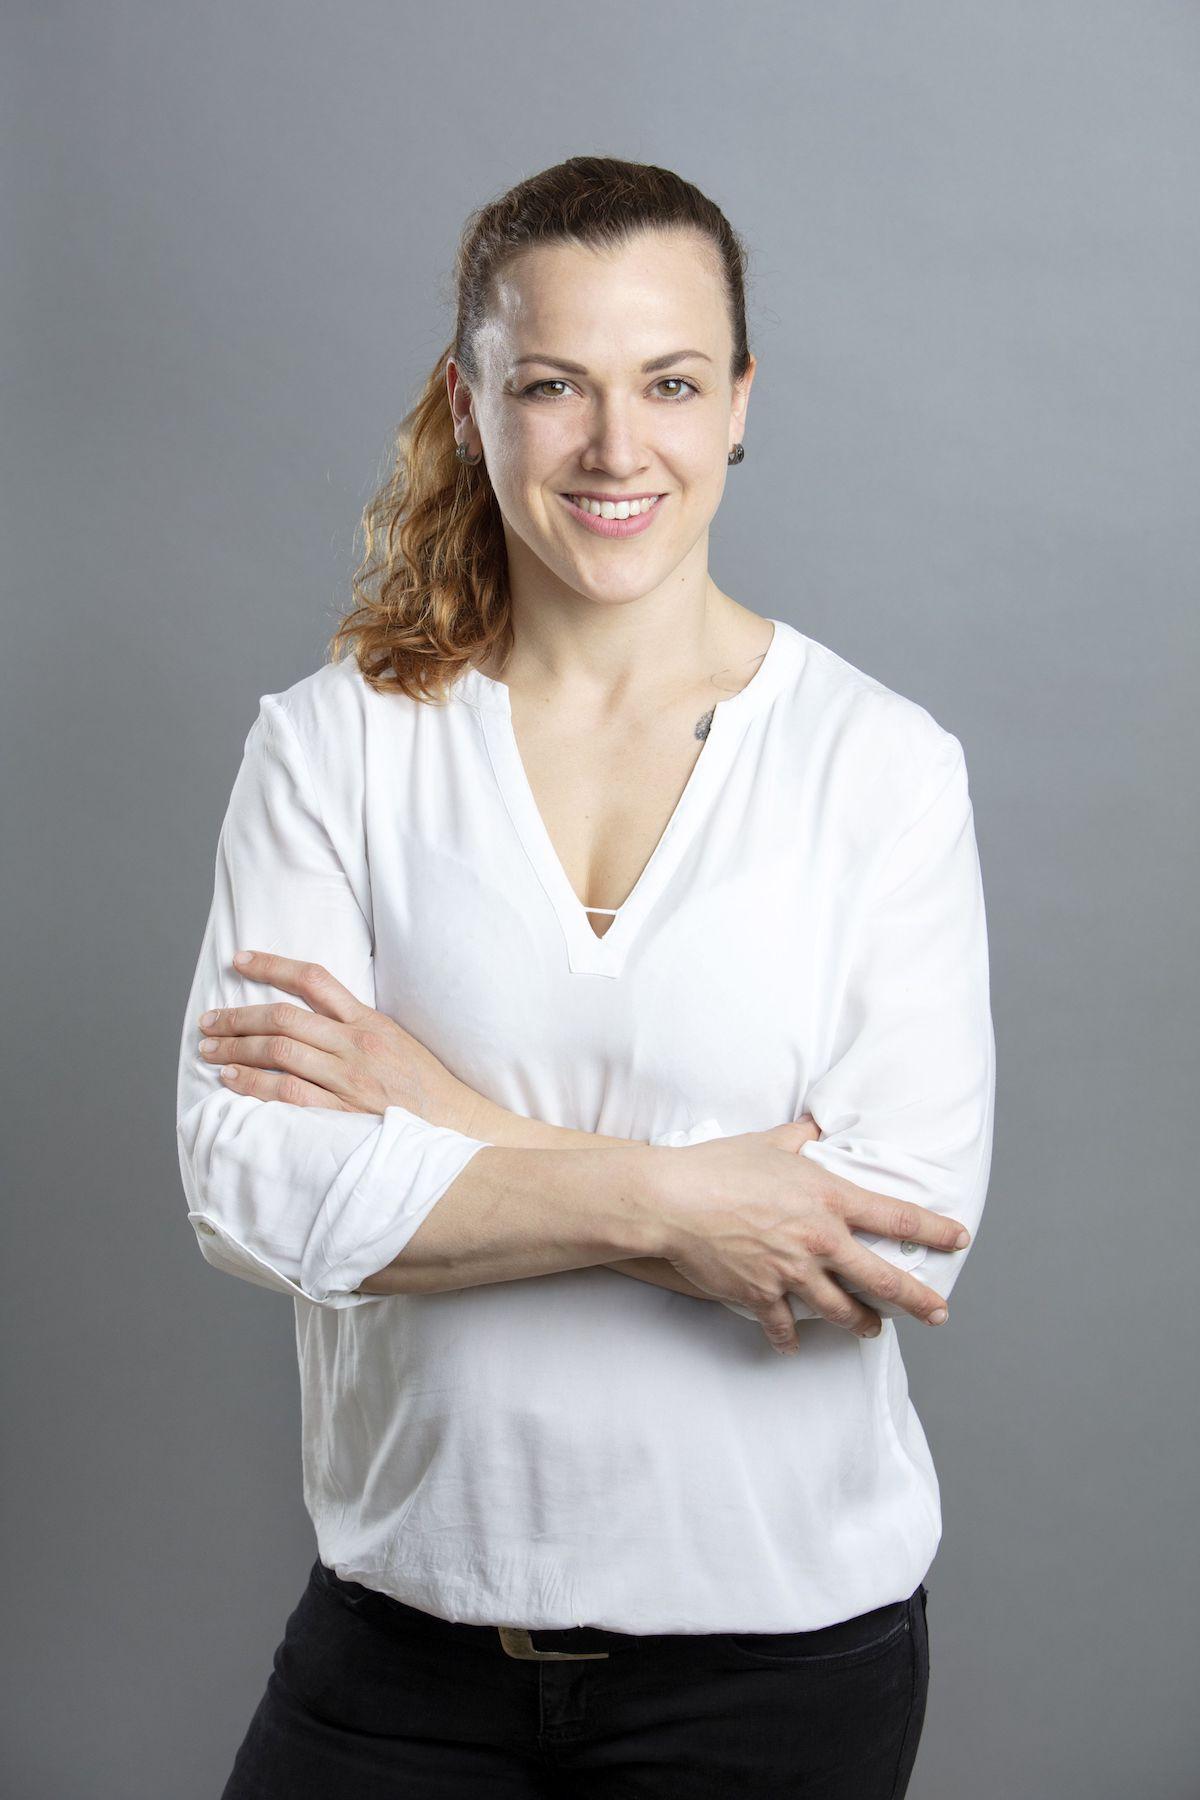 Zdeňka Bursíková